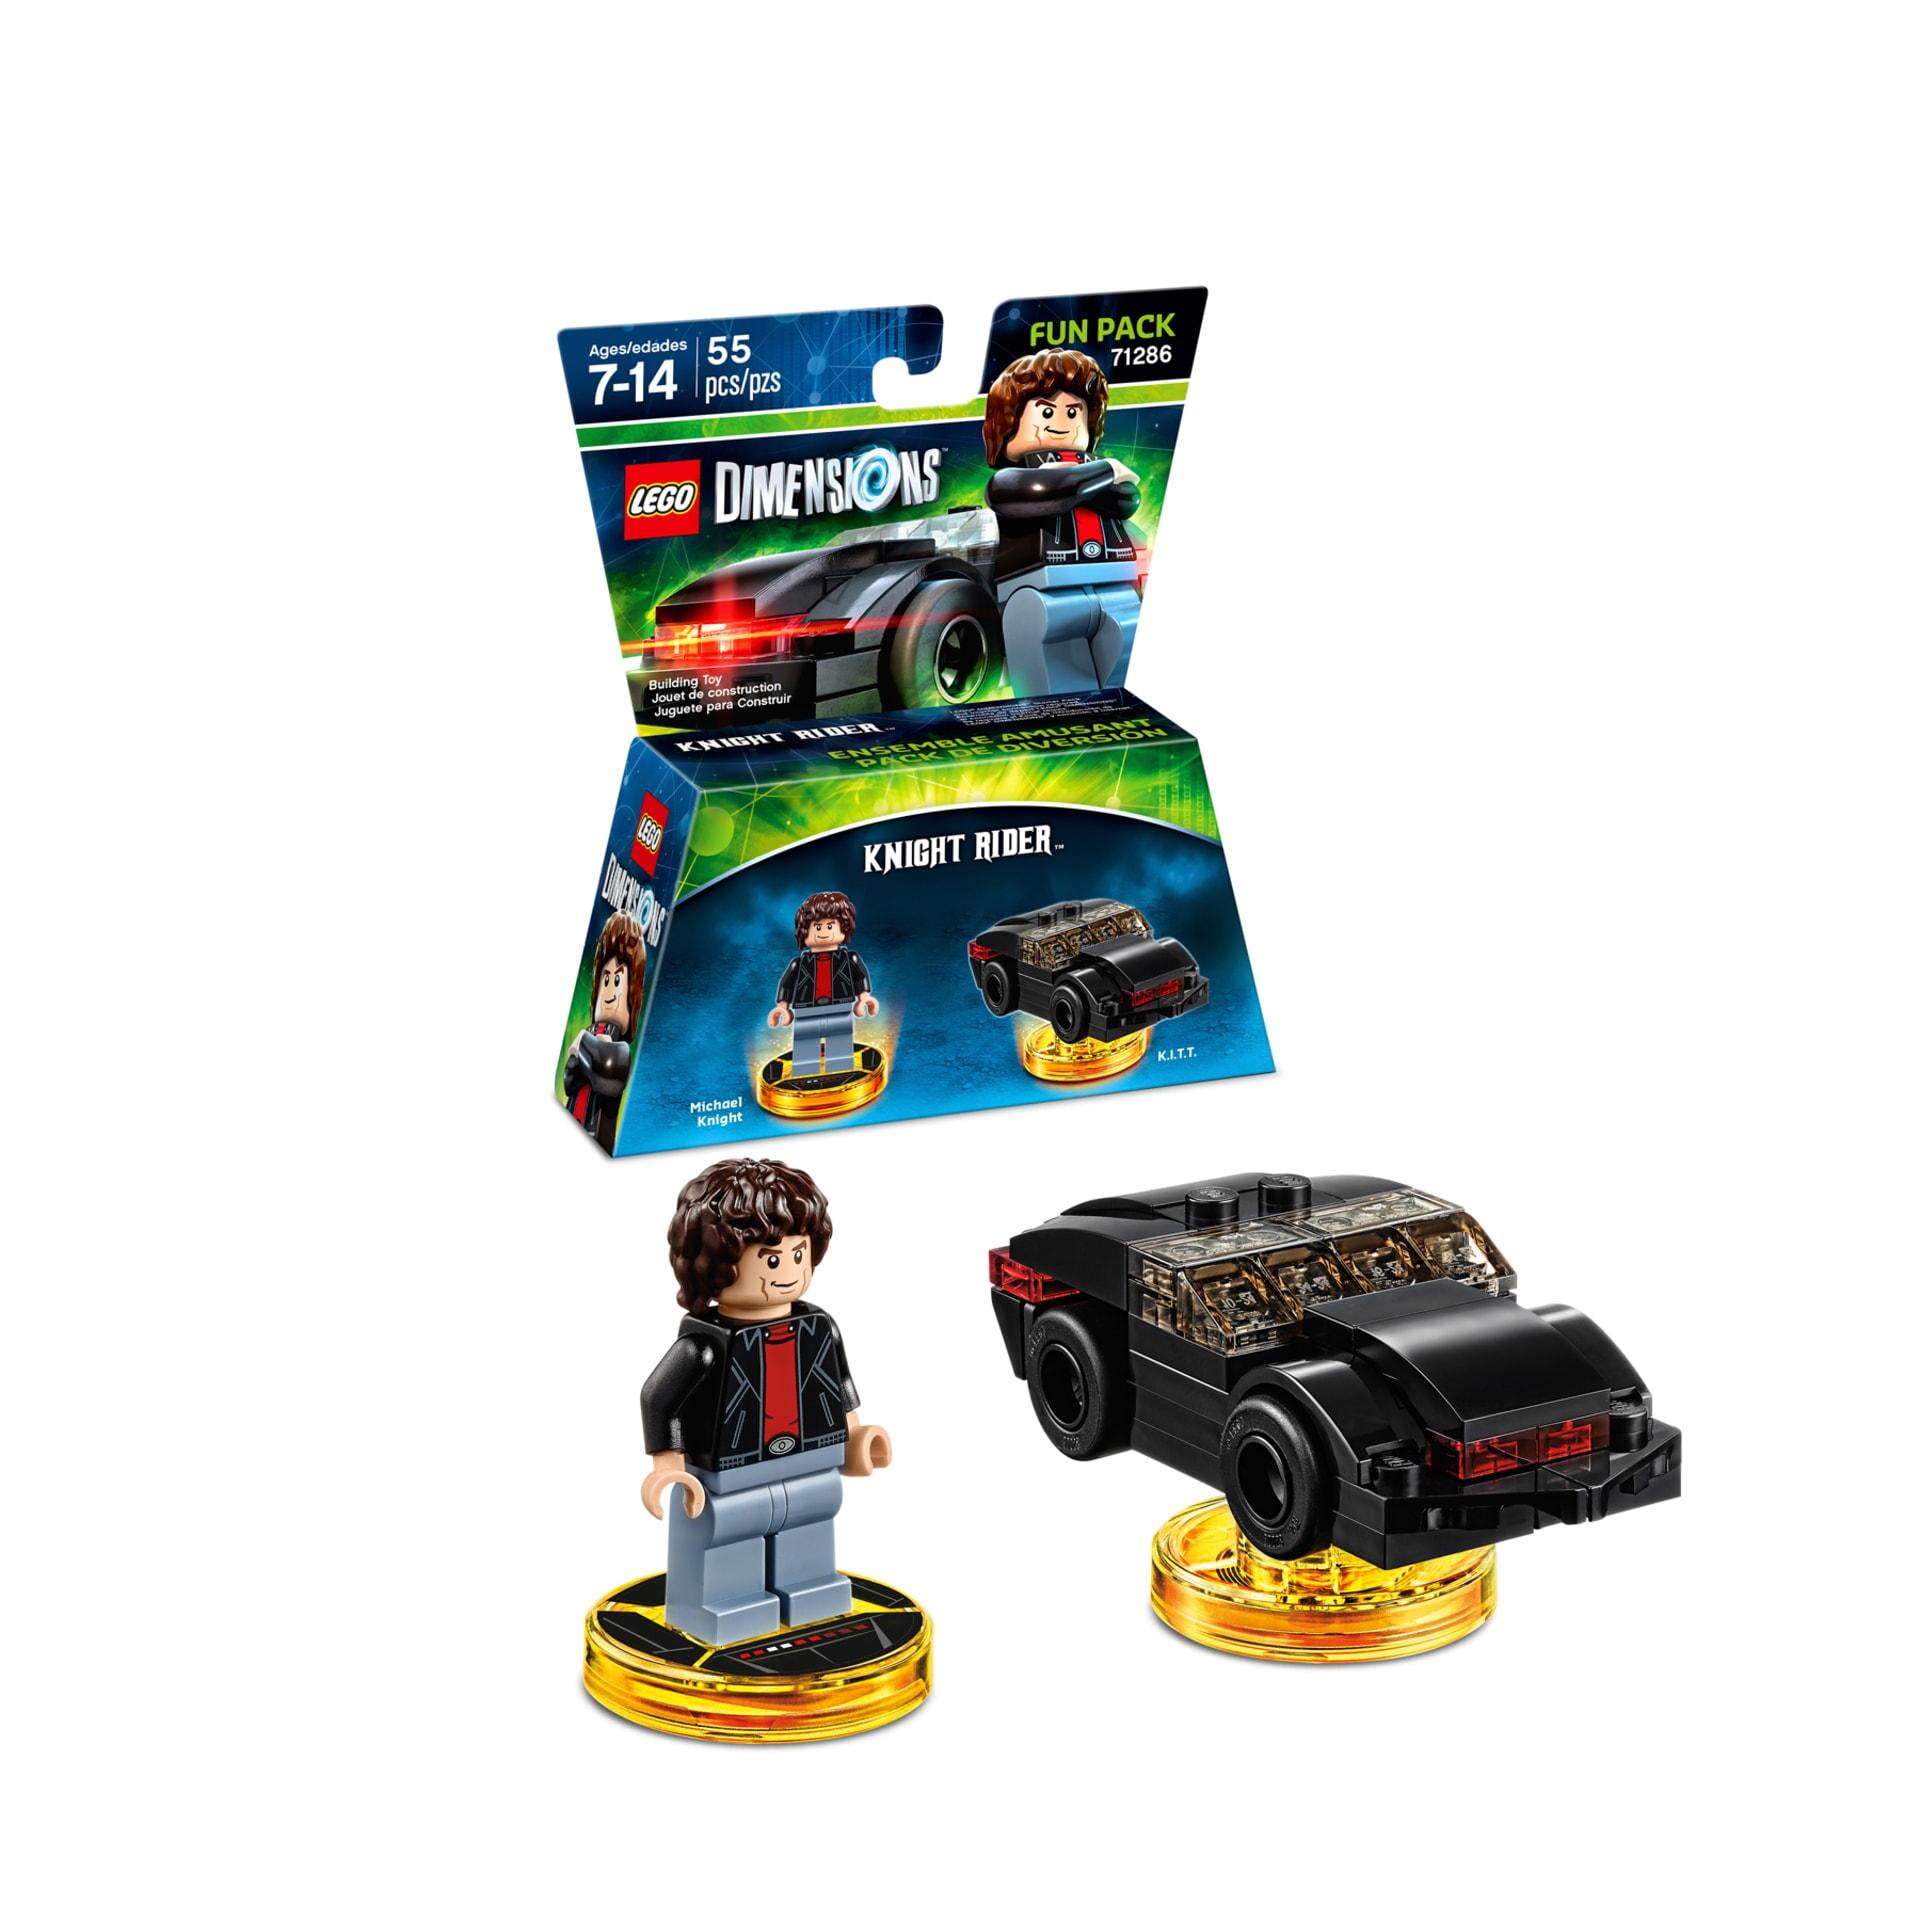 LEGO Dimensions: Knight Rider